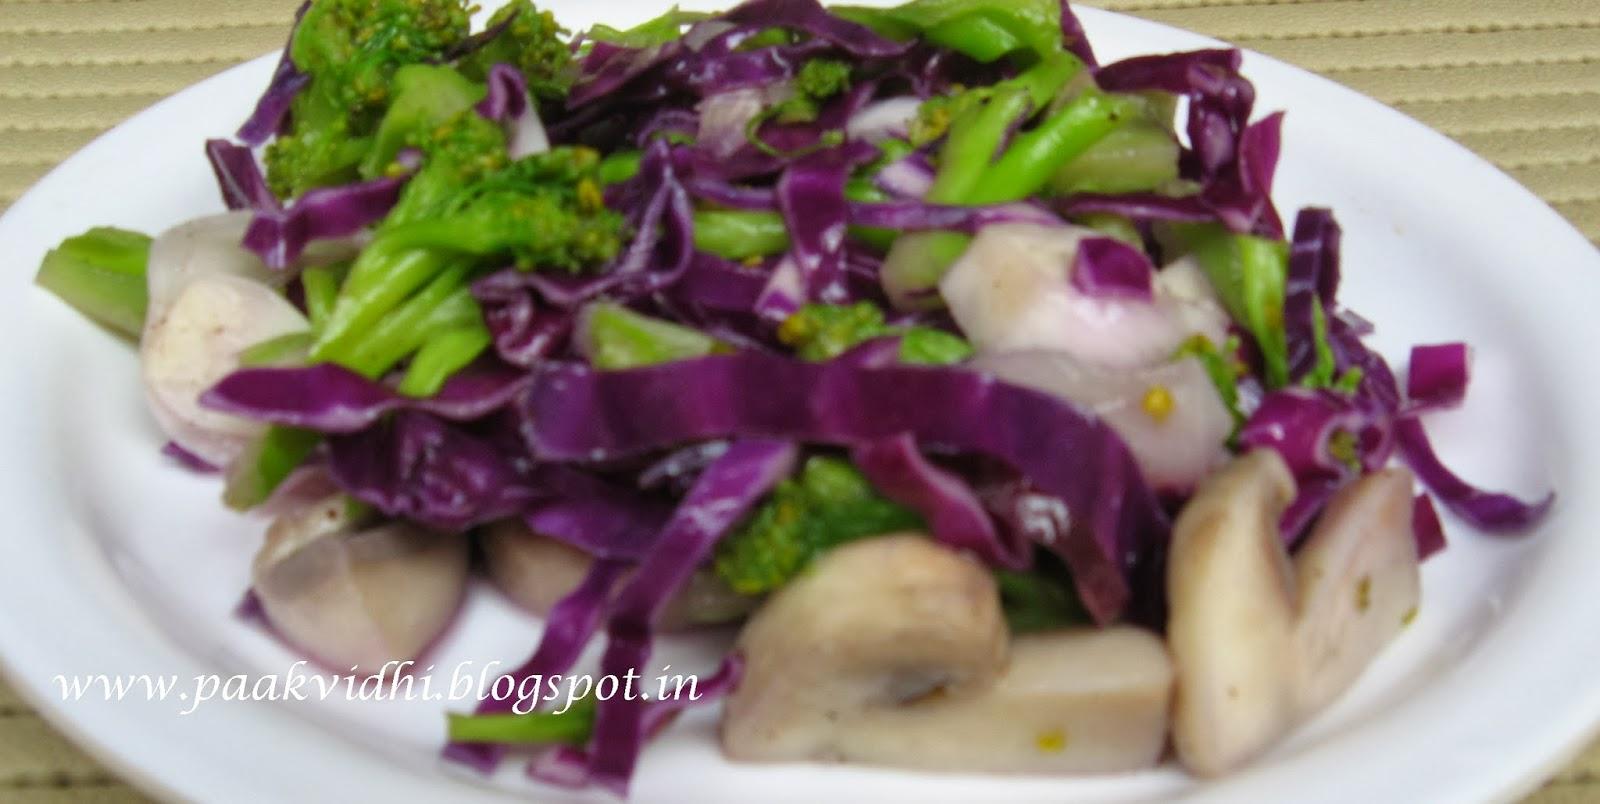 http://paakvidhi.blogspot.in/2014/03/broccoli-salad.html